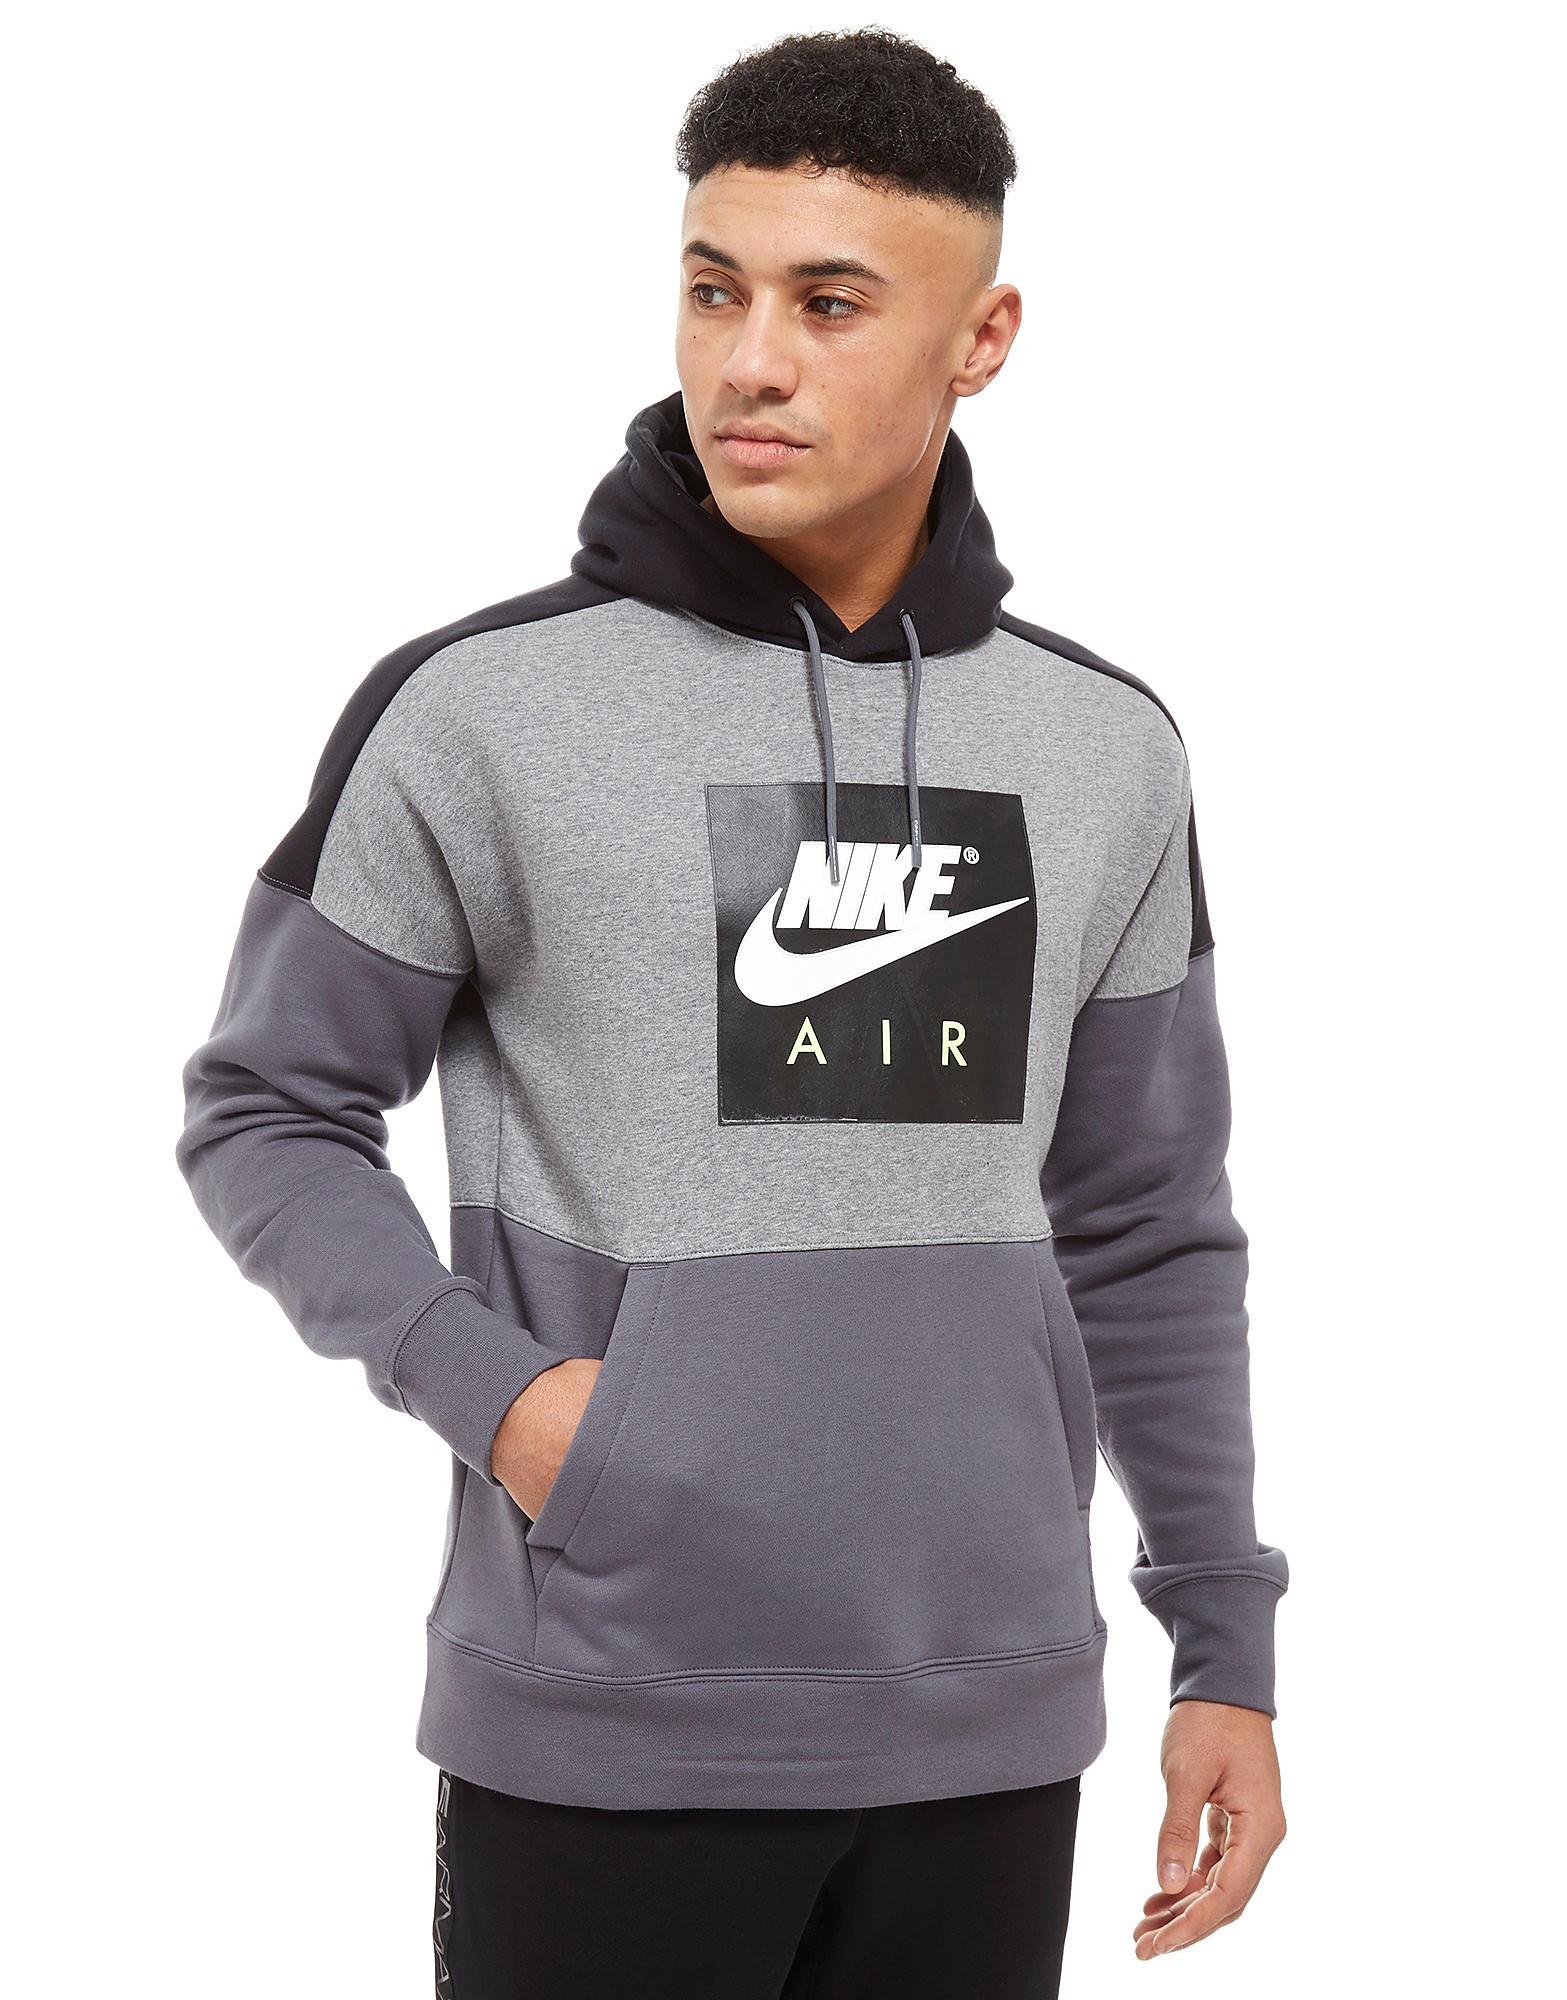 Nike Sweat à capuche Air Overhead Colourblock Homme